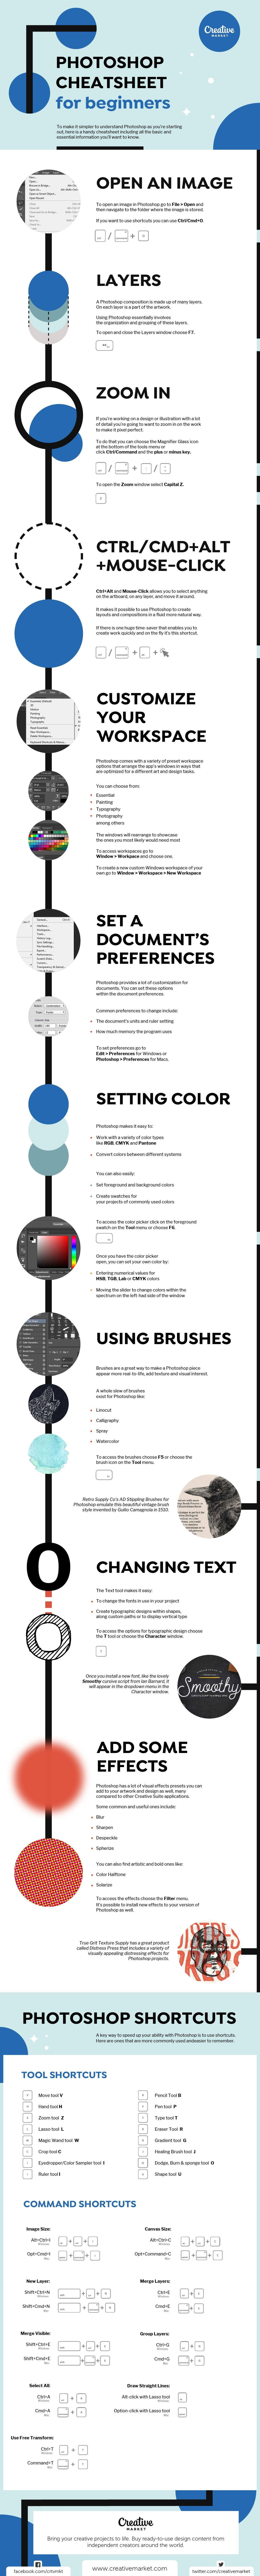 Photoshop Cheatsheet for Beginners